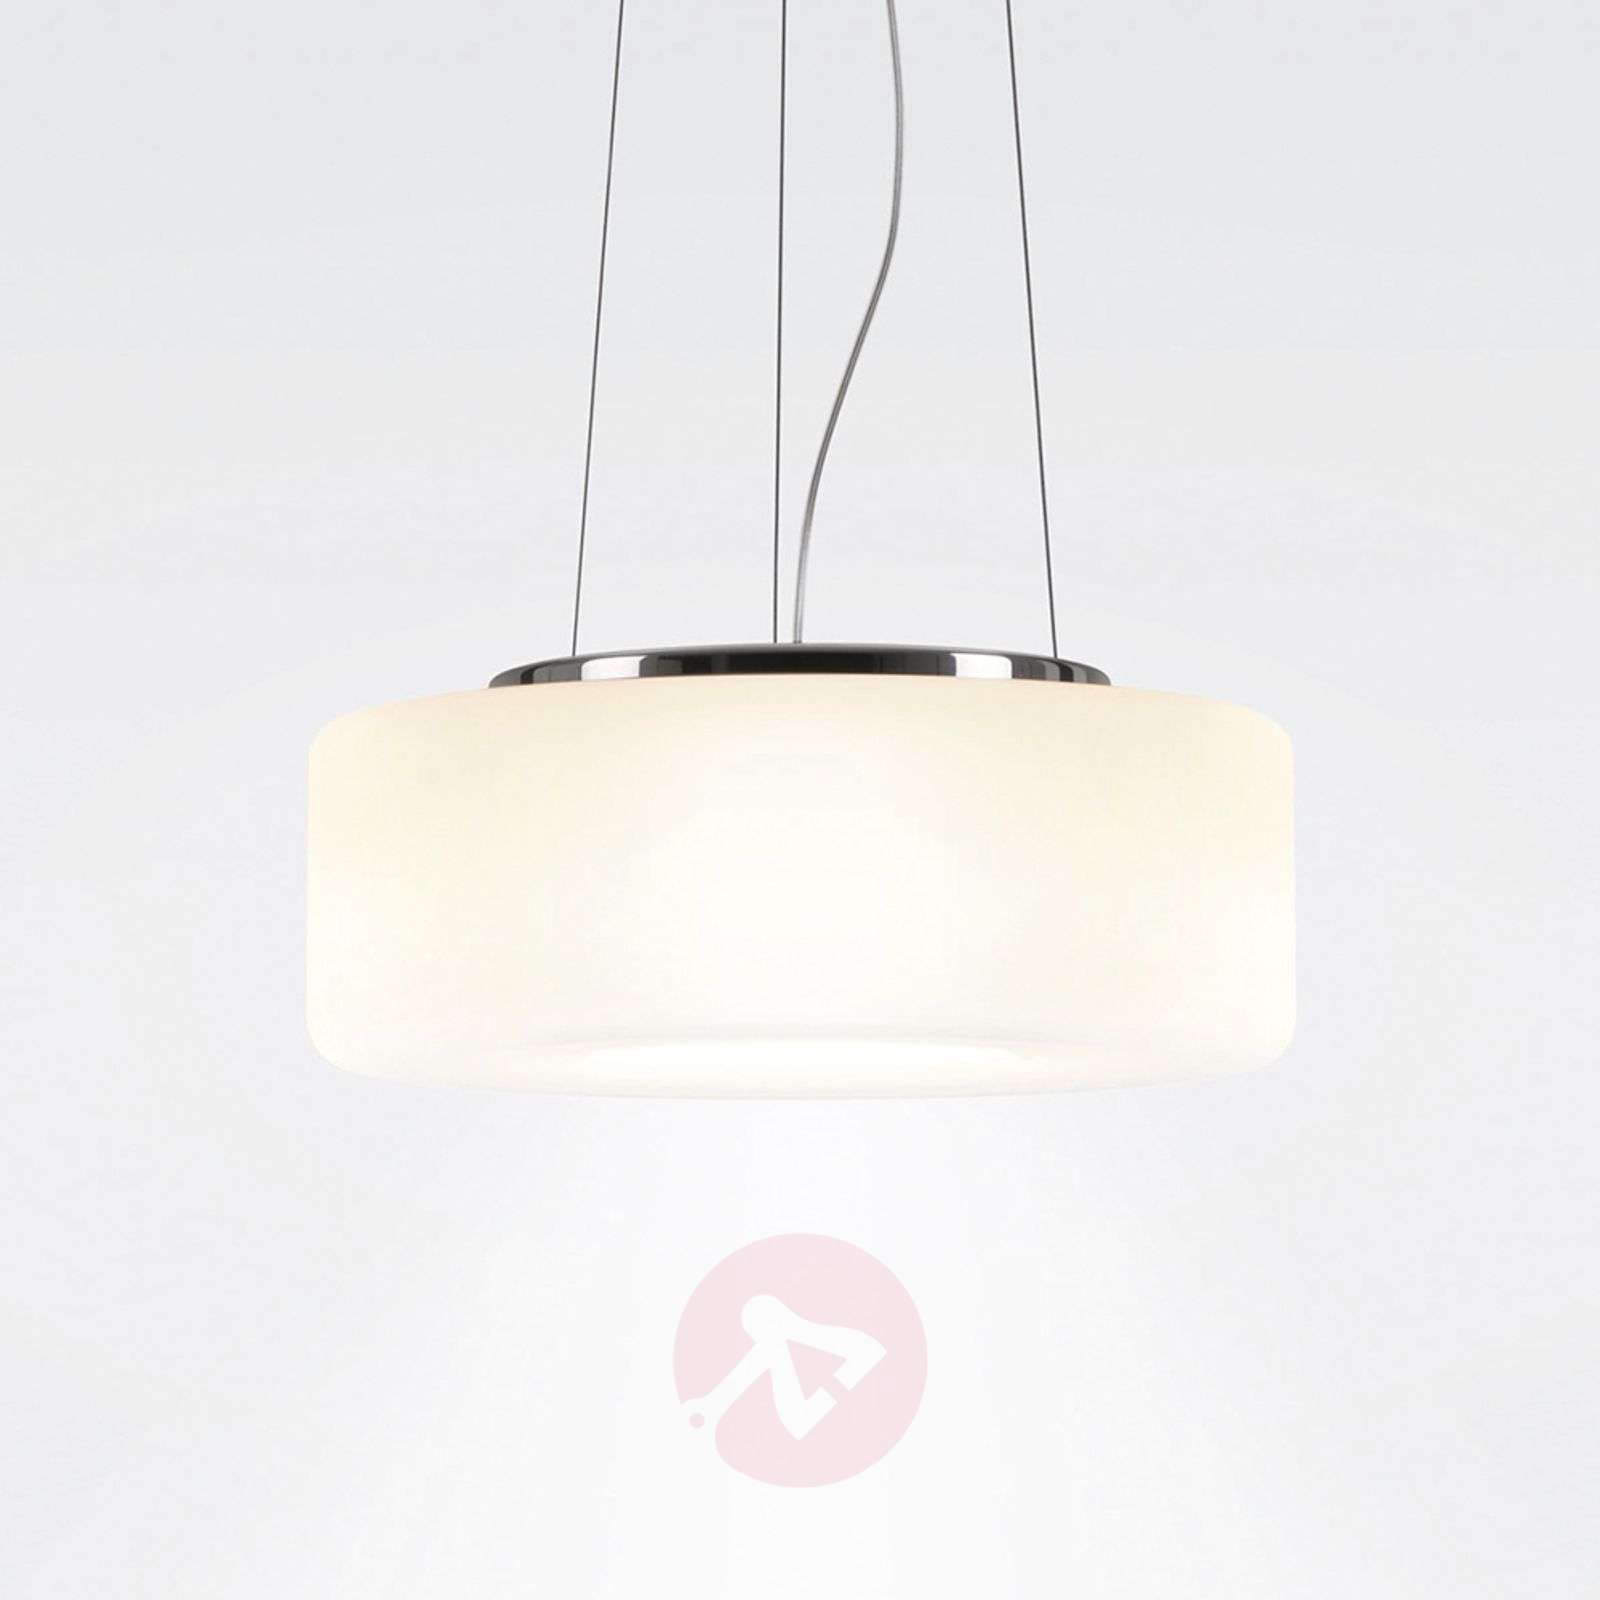 Opaali LED-riippuvalaisin Curling S-8550044-01